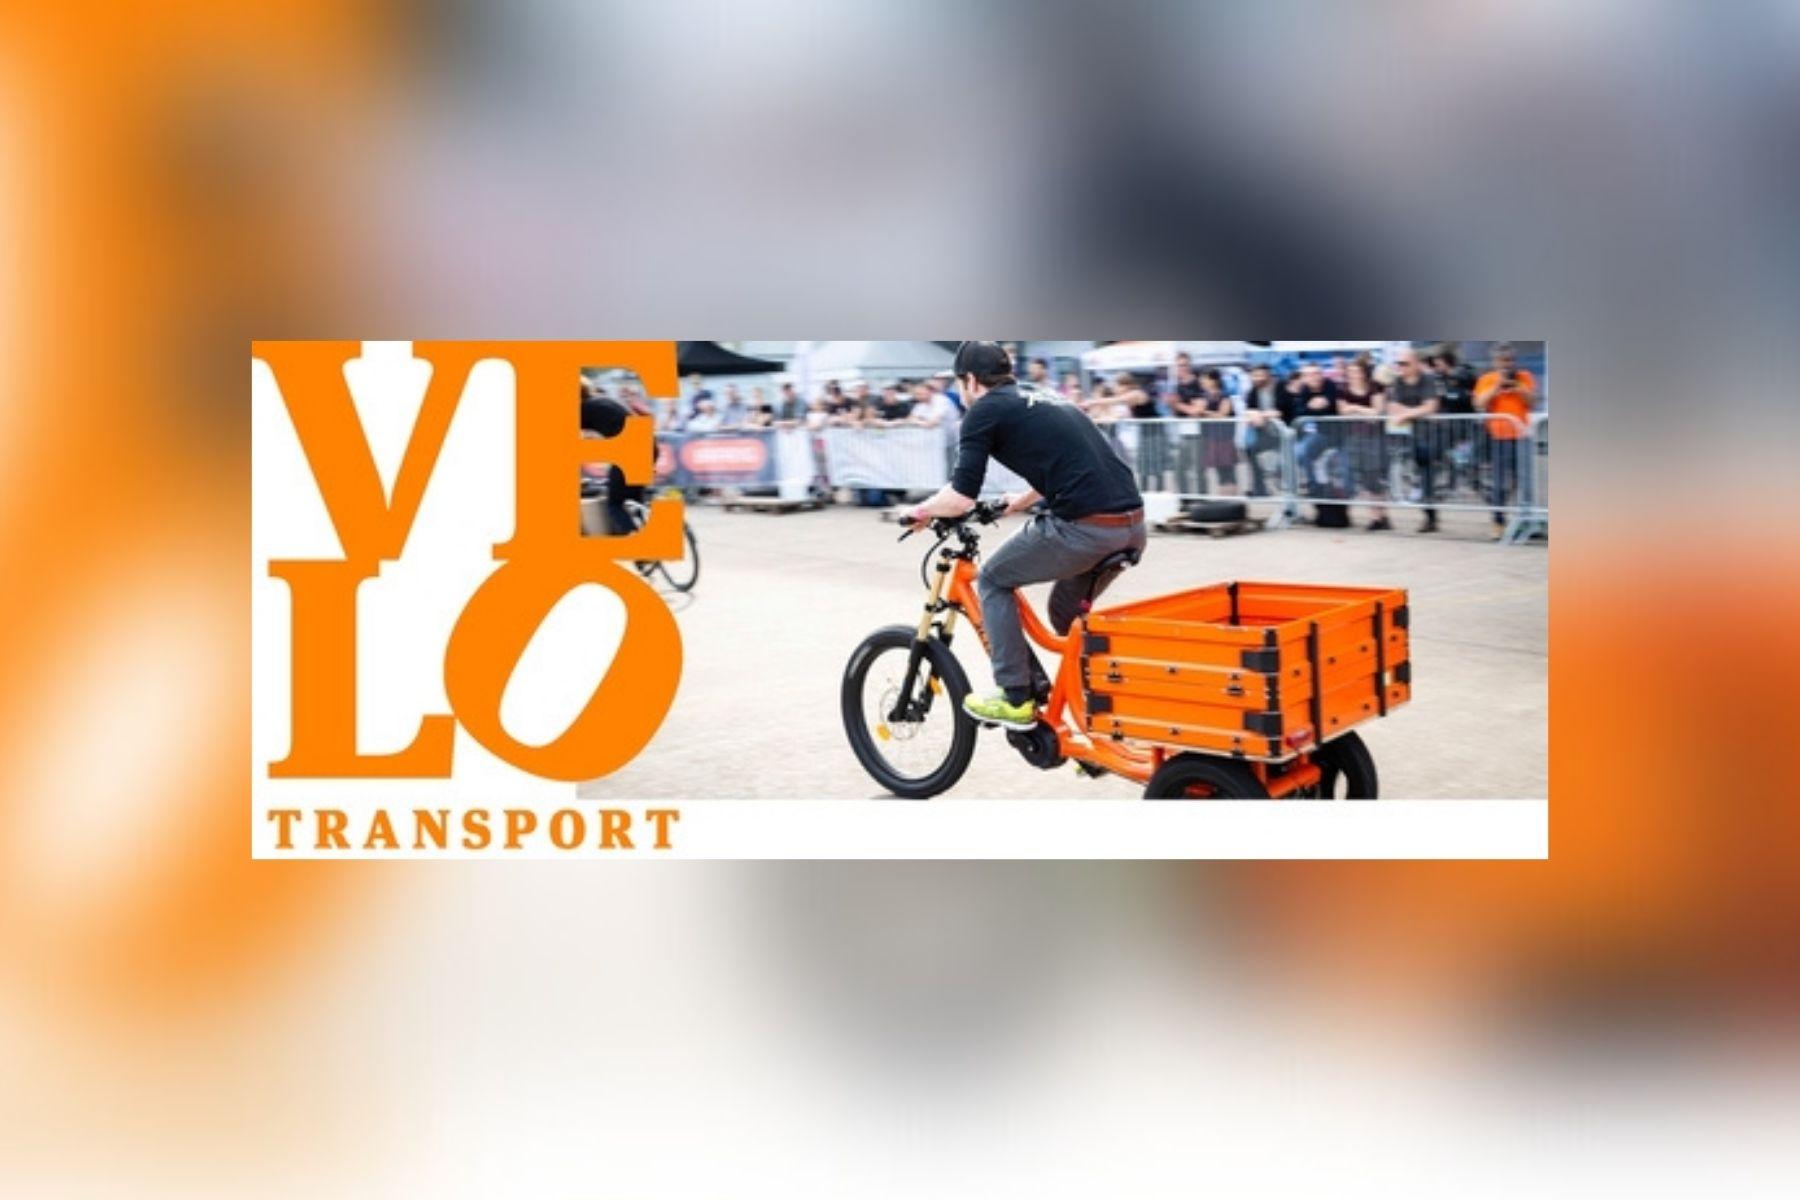 VELOTransport 2021 - Call for Positions